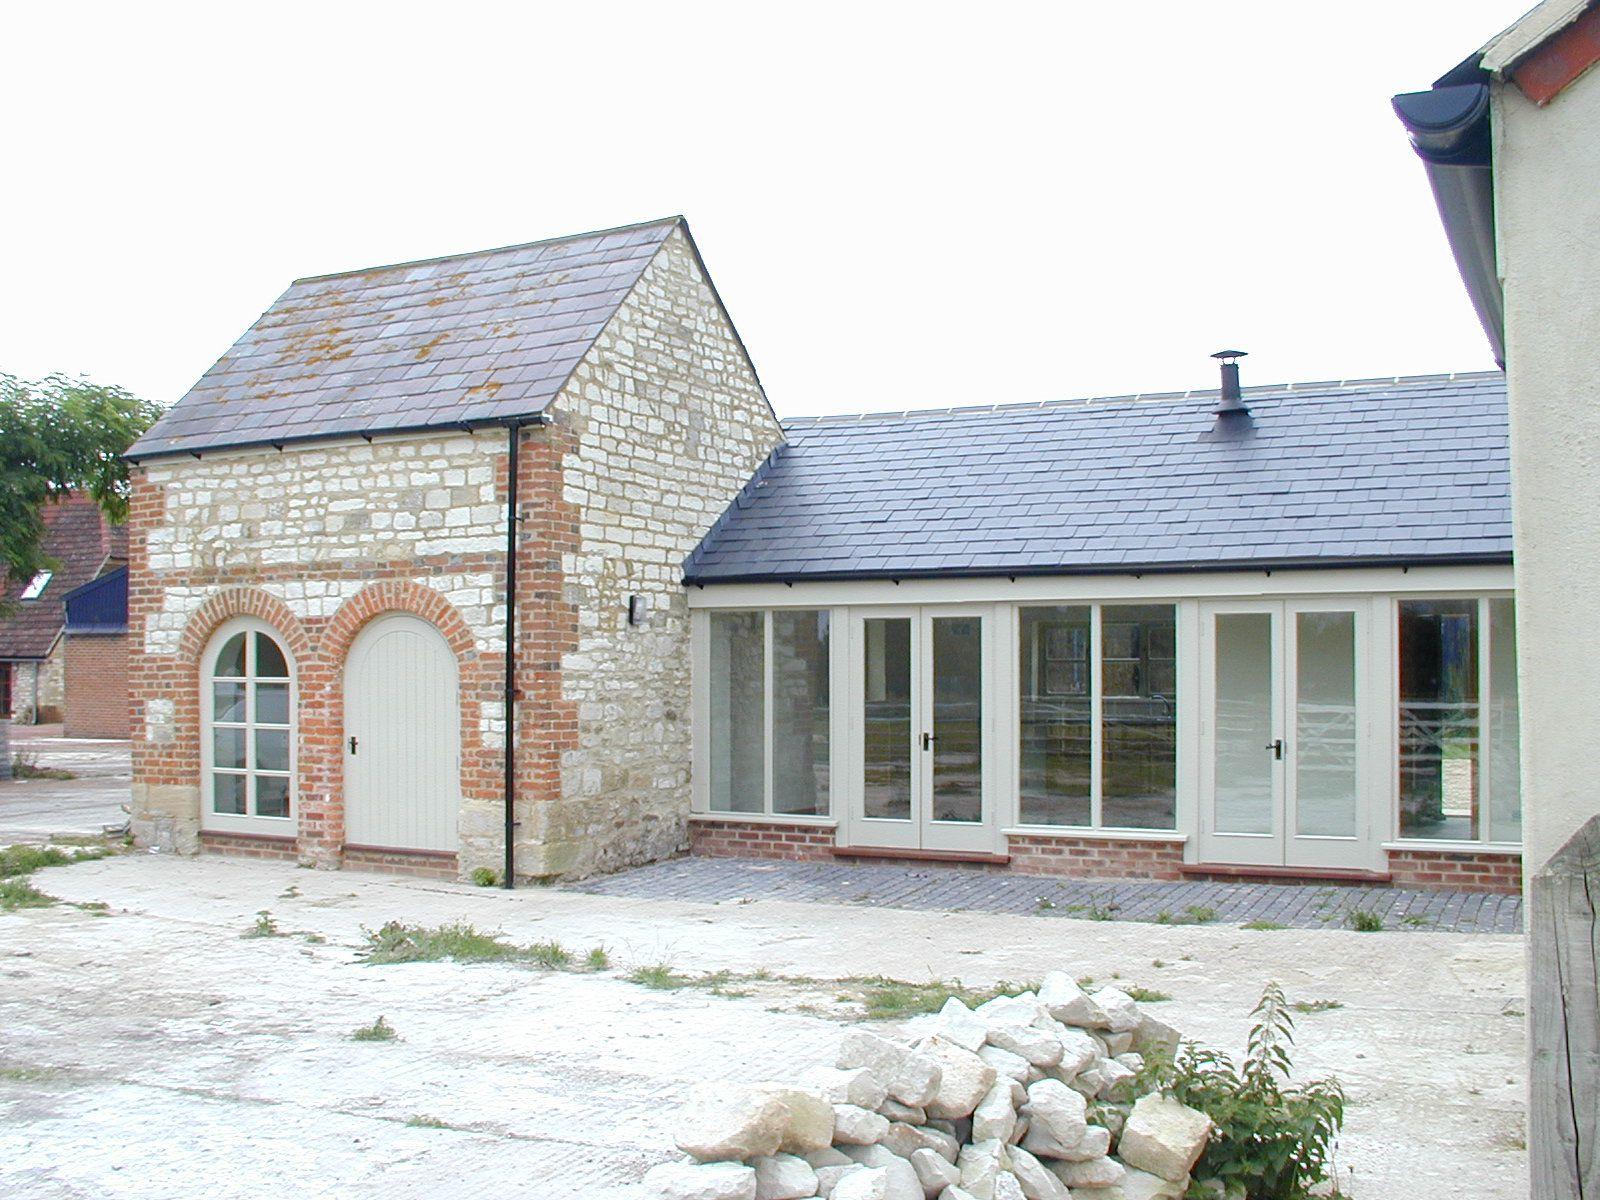 2 - Conversions - Oxfordshire Manor Farm, Kingston Lisle